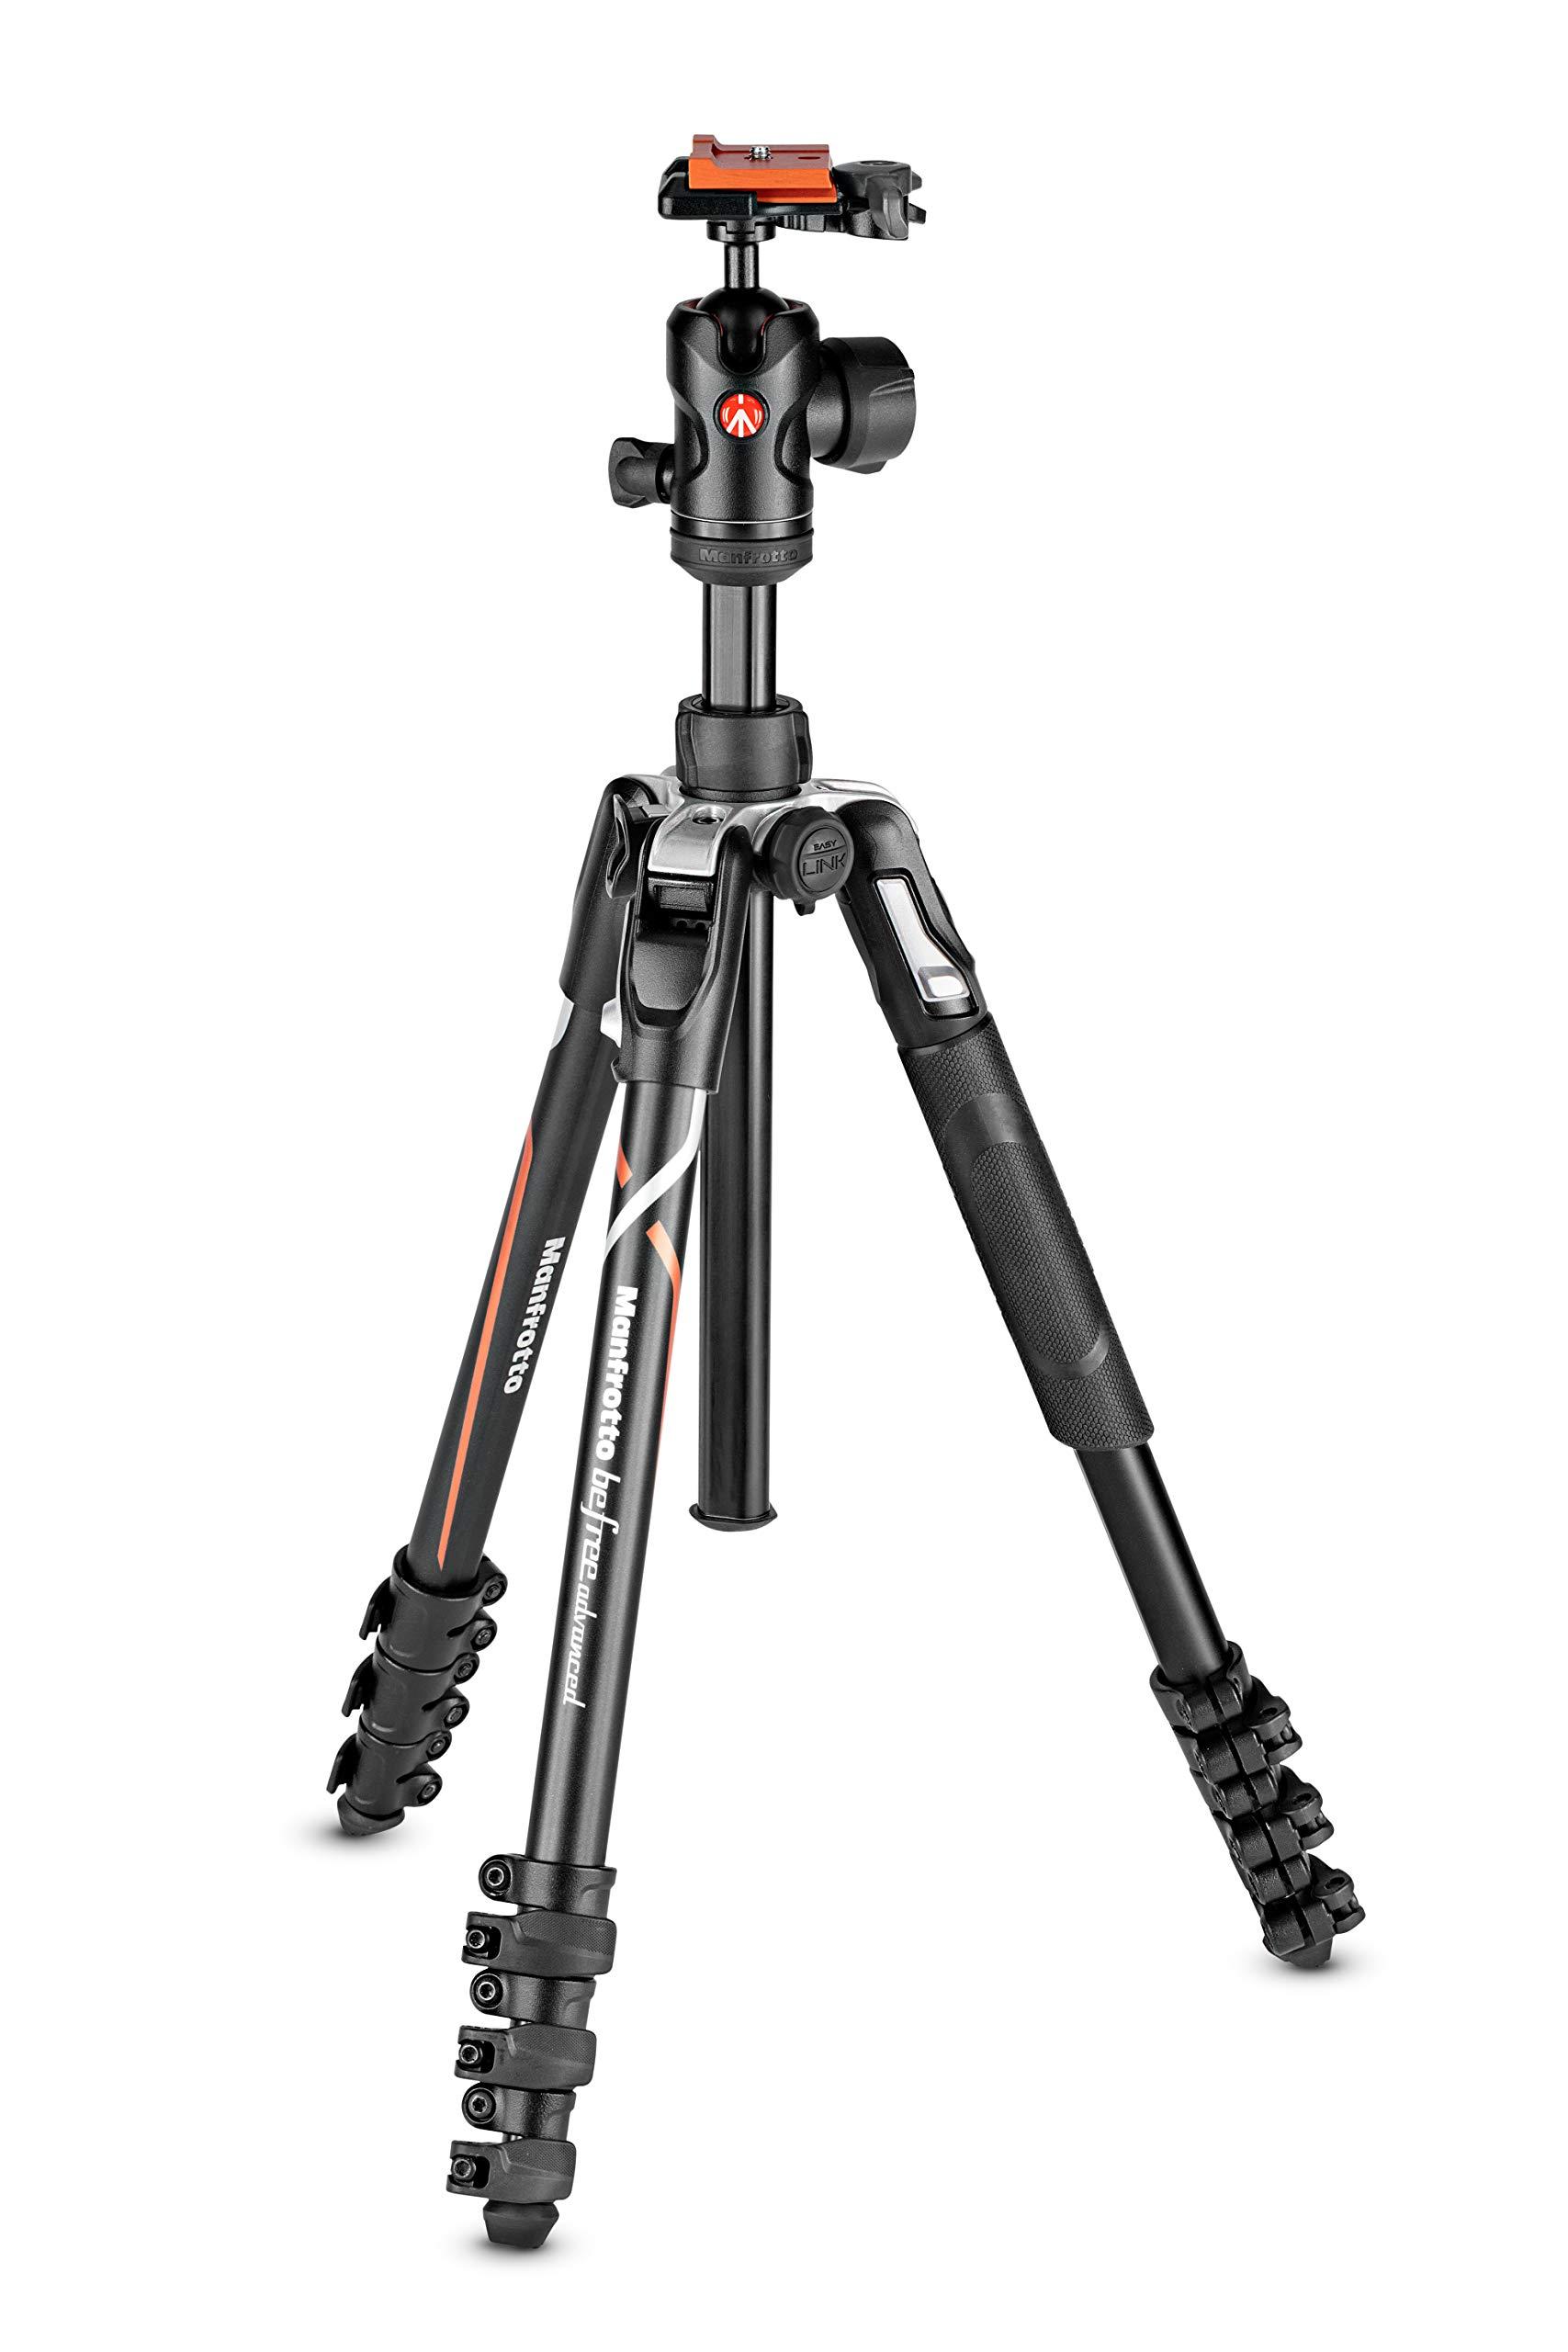 Manfrotto MKBFRLA-BH Digital/Film Cameras 3leg/Leg Black,Silver Tripod